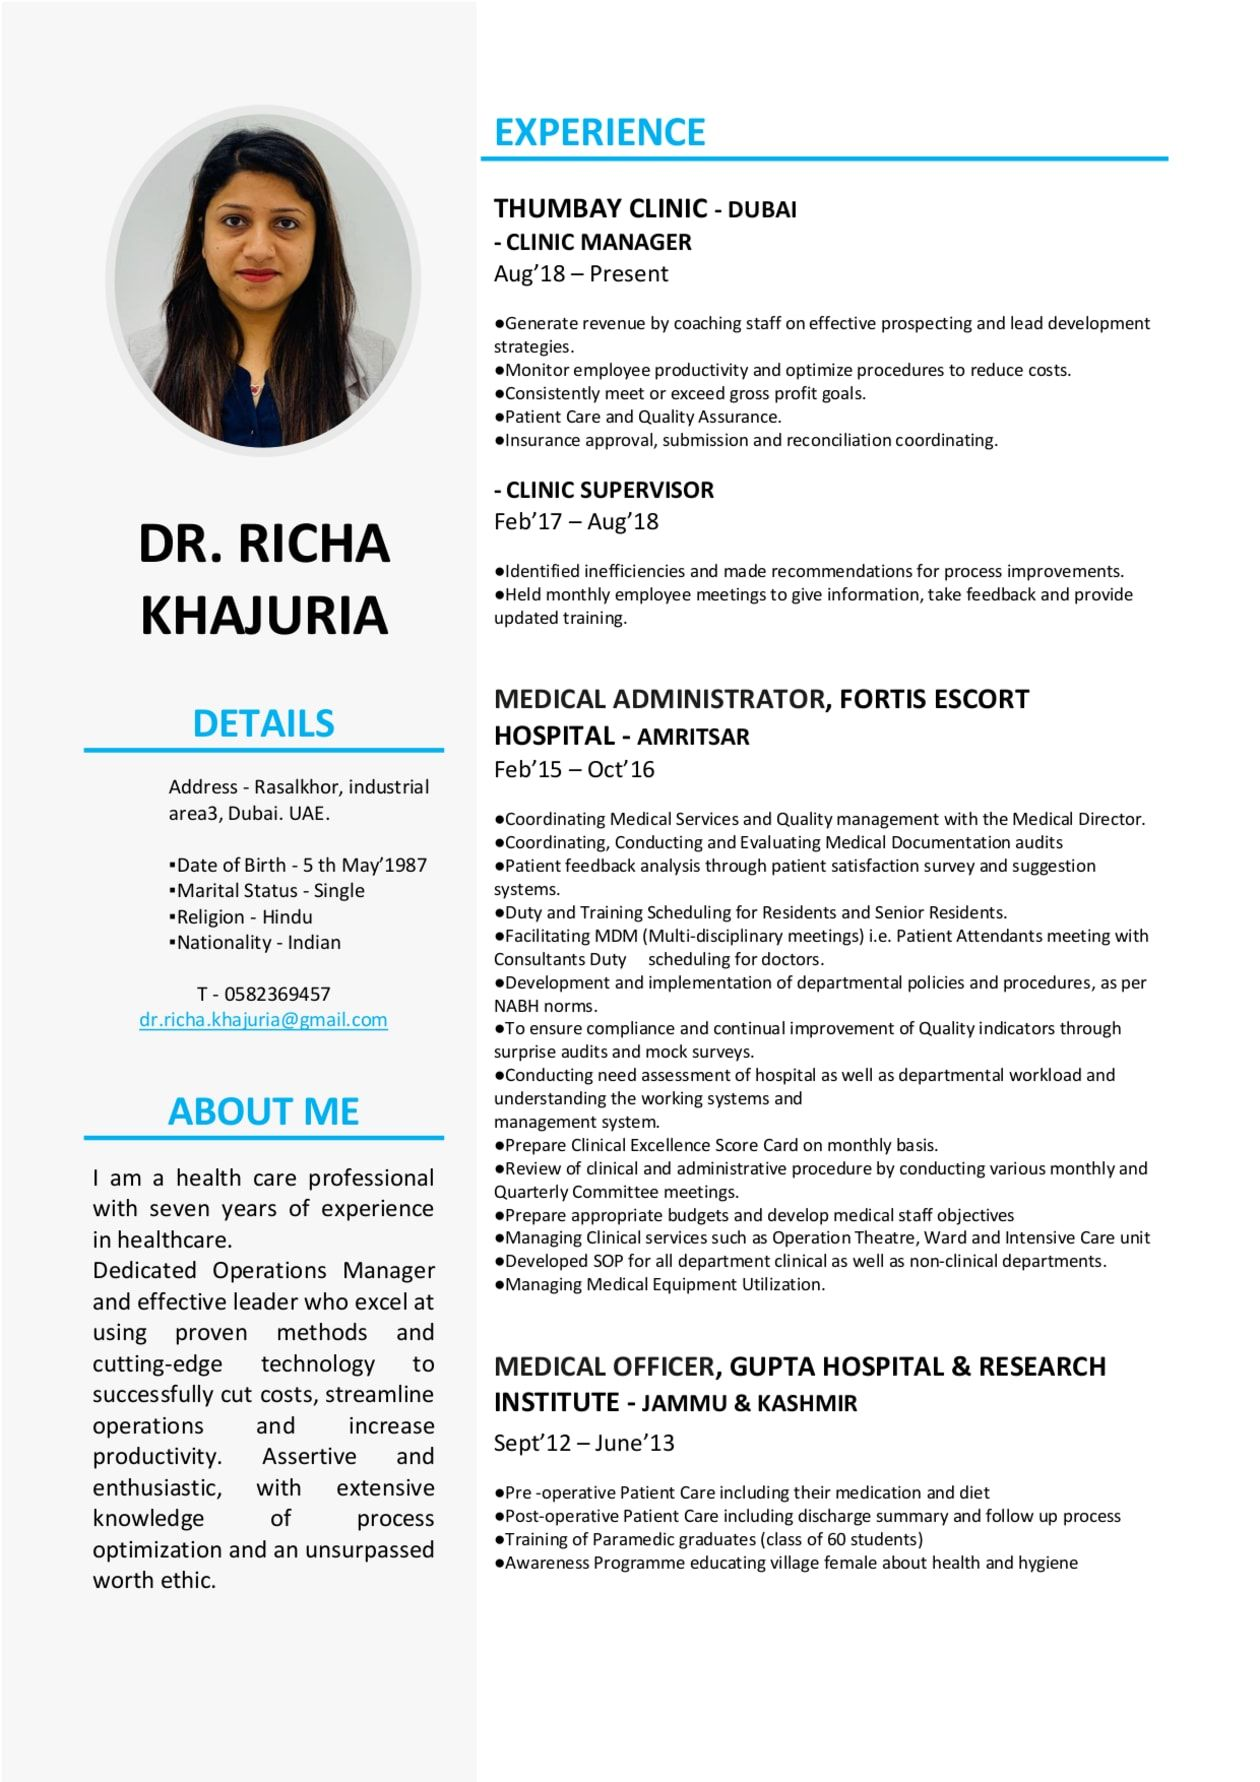 I Will Design Professional Resume Cv Curriculum Vitae Resume Design Curriculum Vitae Resume Cv